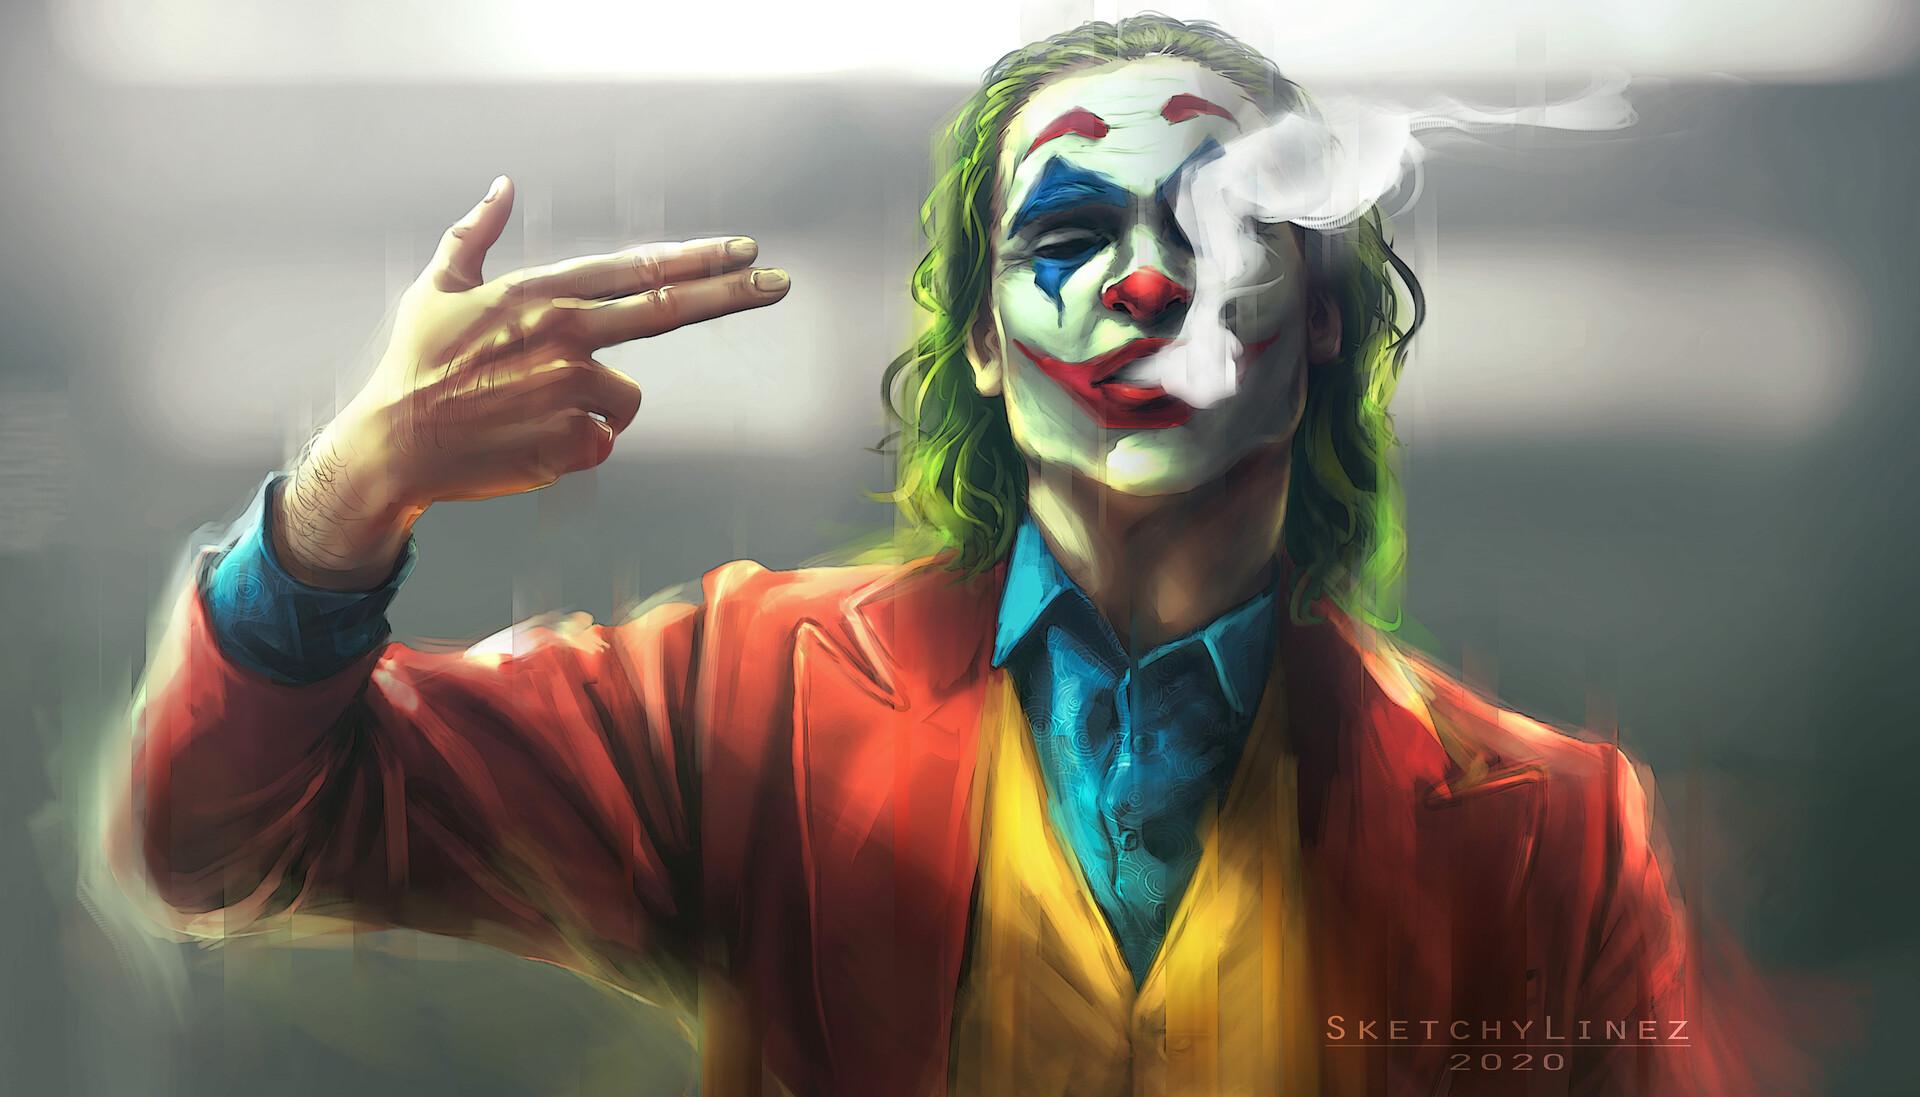 Wallpaper Pelawak Joker 2019 Movie Joaquin Phoenix Karya Penggemar Gambar Bioskop Dc Comics Dc Universe Potret Seni Digital 1920x1097 Kisarashi 1914817 Hd Wallpapers Wallhere